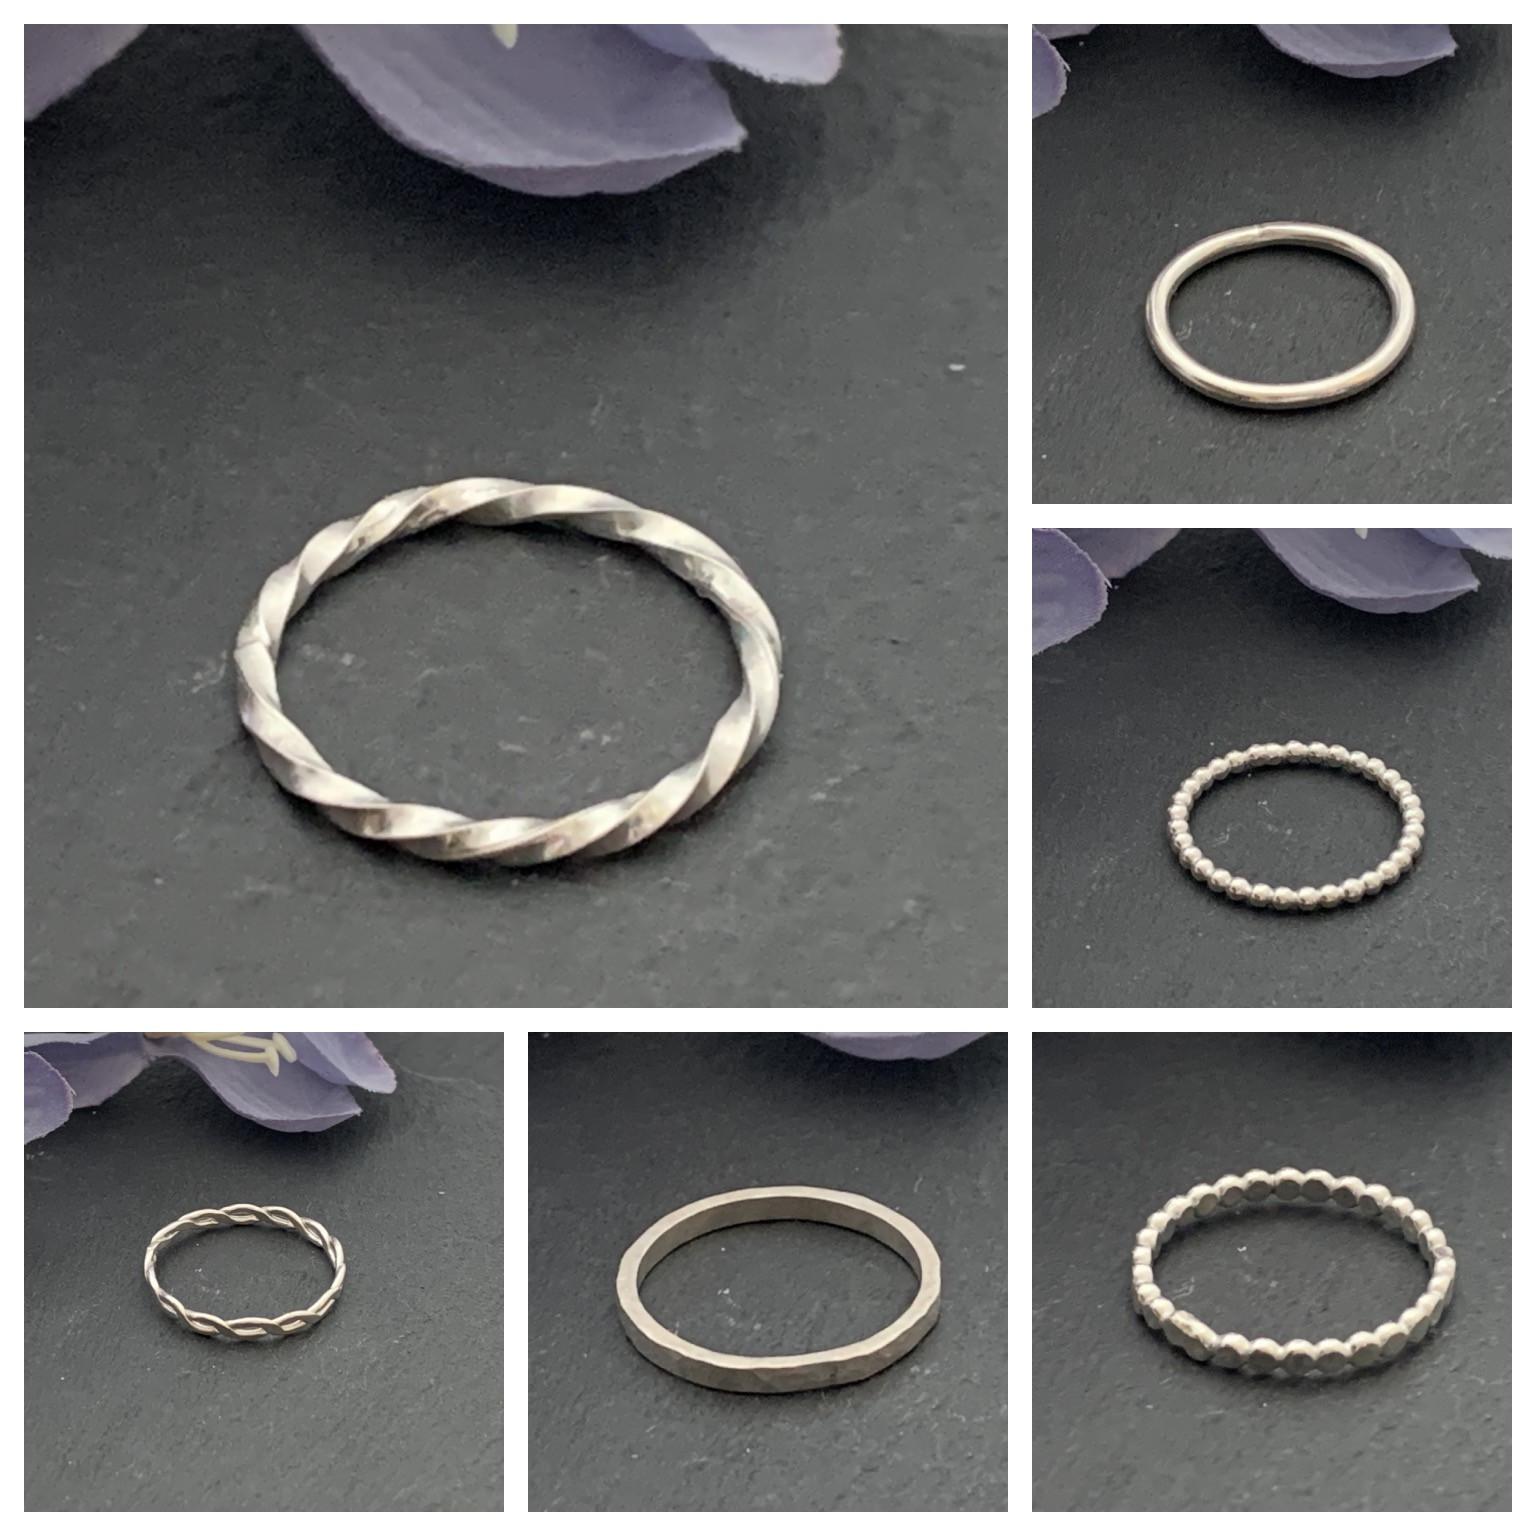 Simple ring workshop 11.00 - 2.00 pm